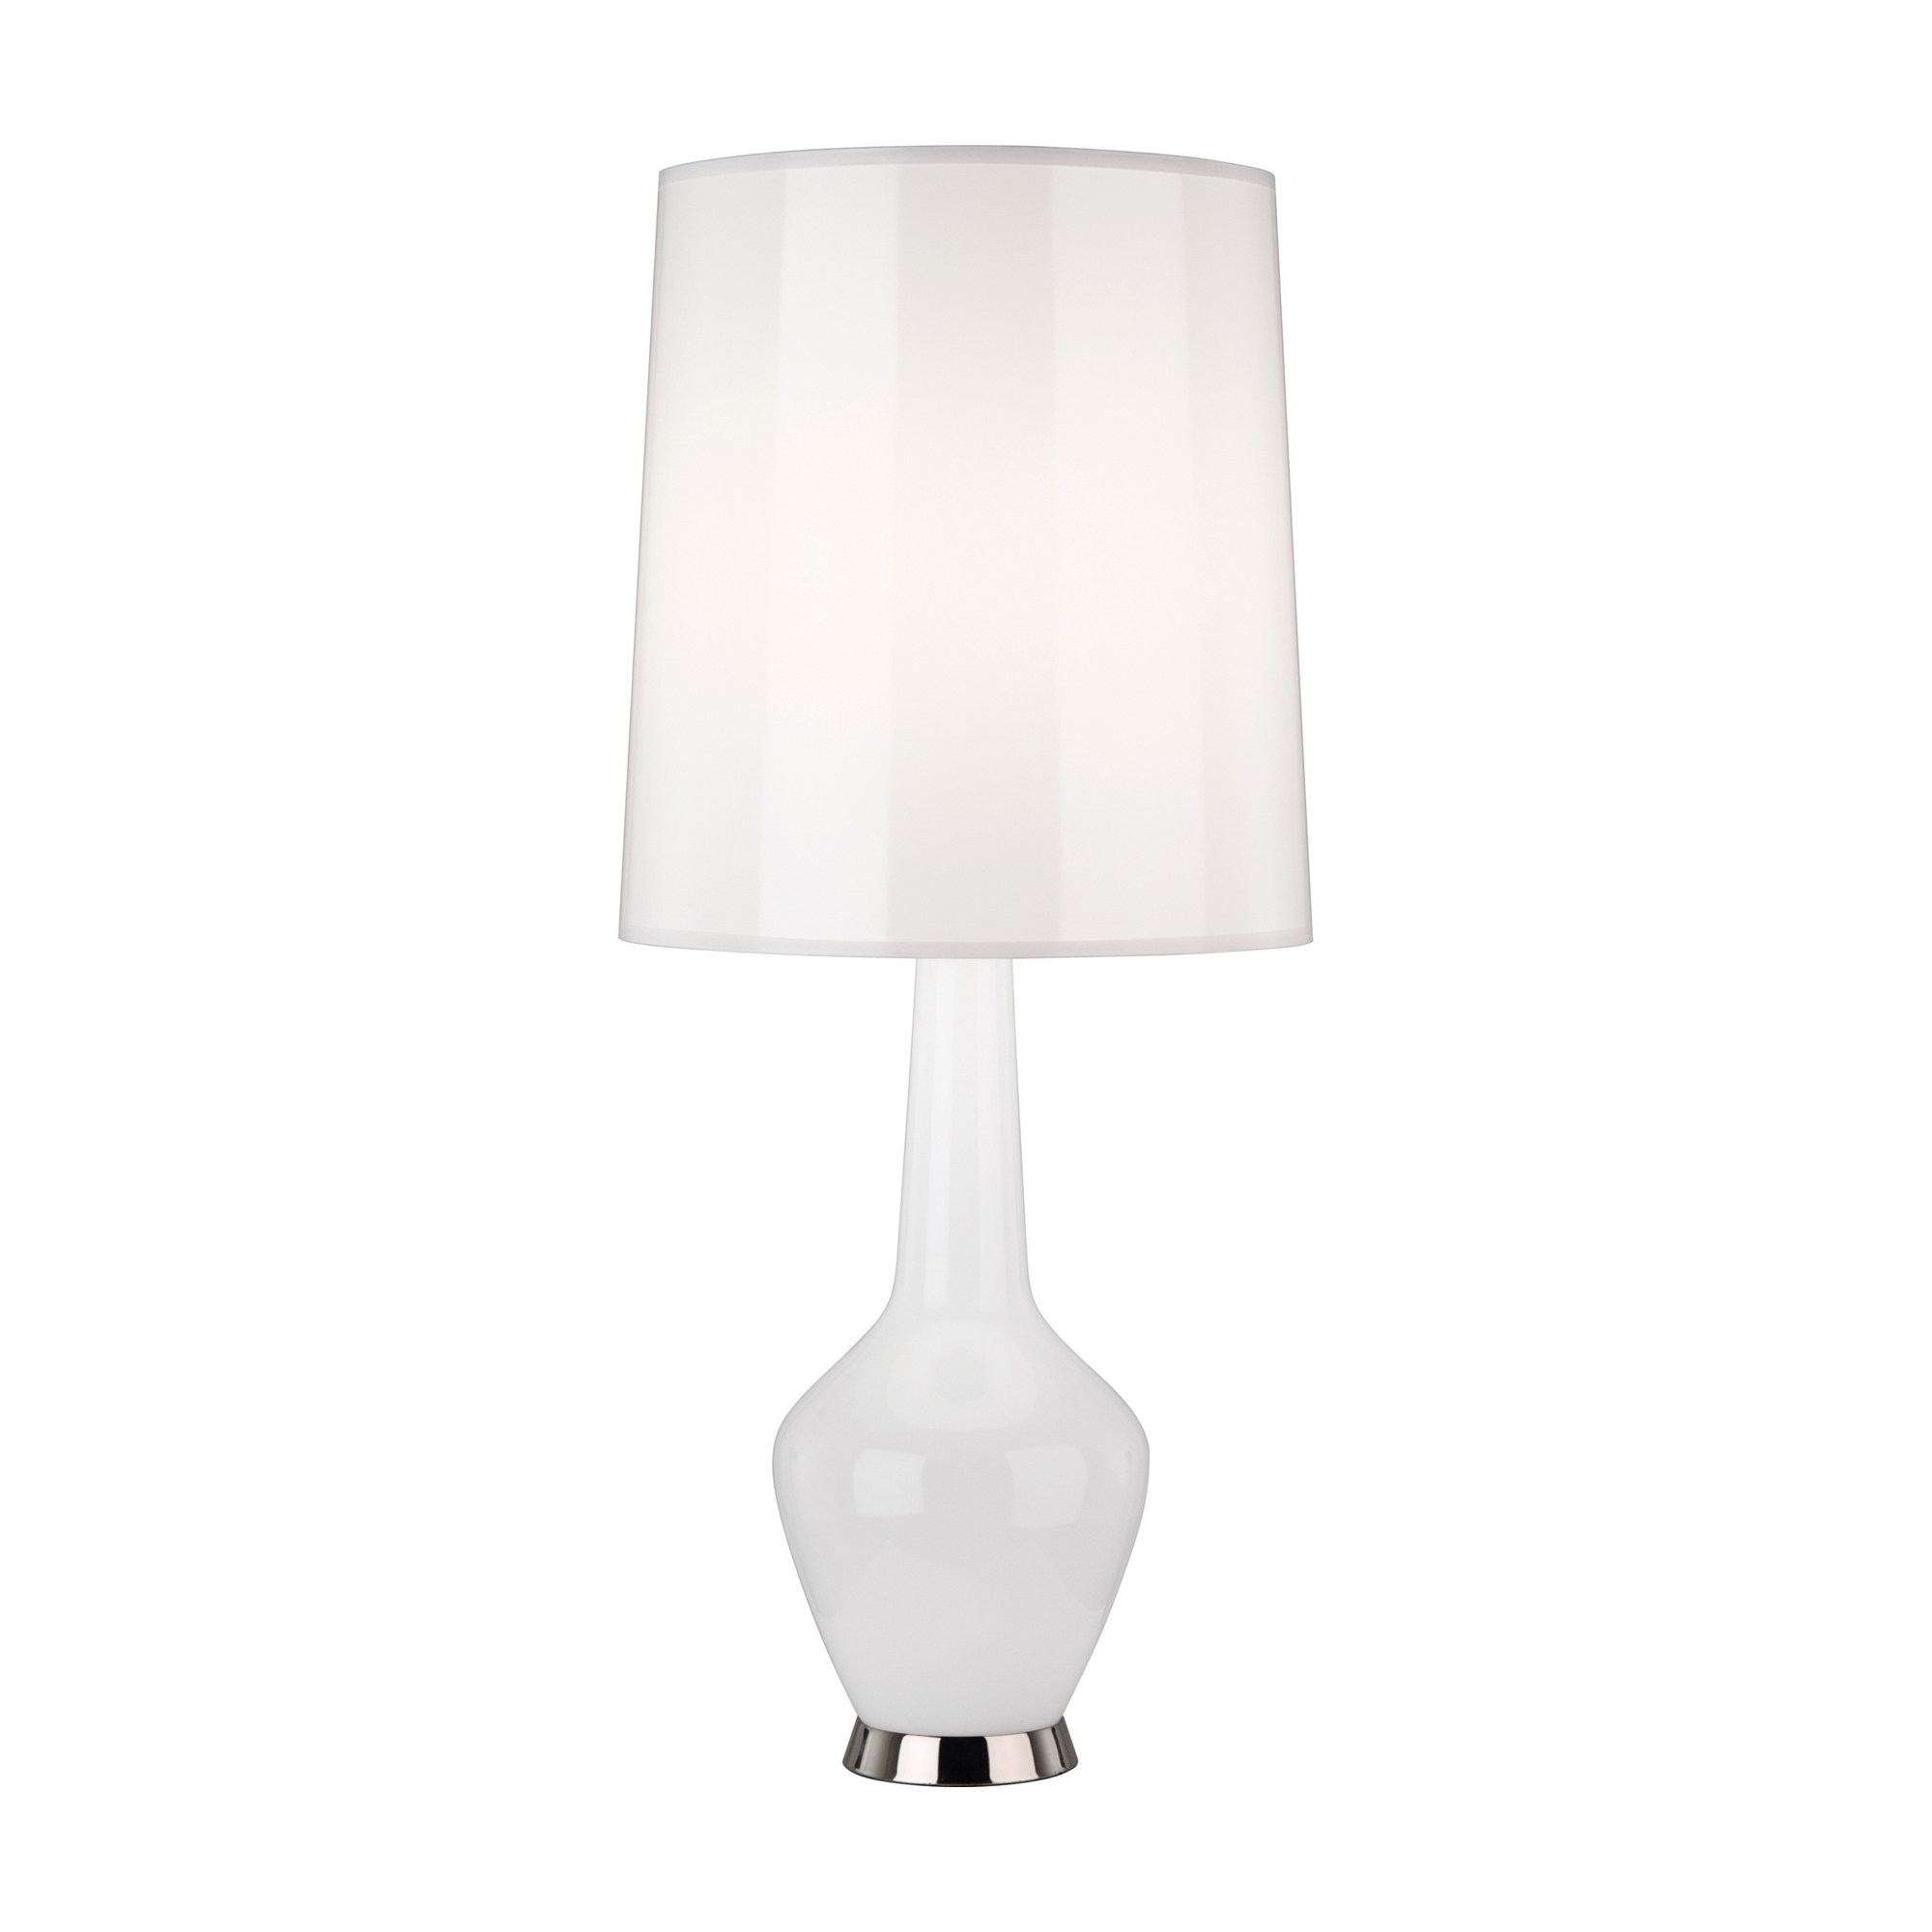 Jonathan Adler Capri Accent Lamp